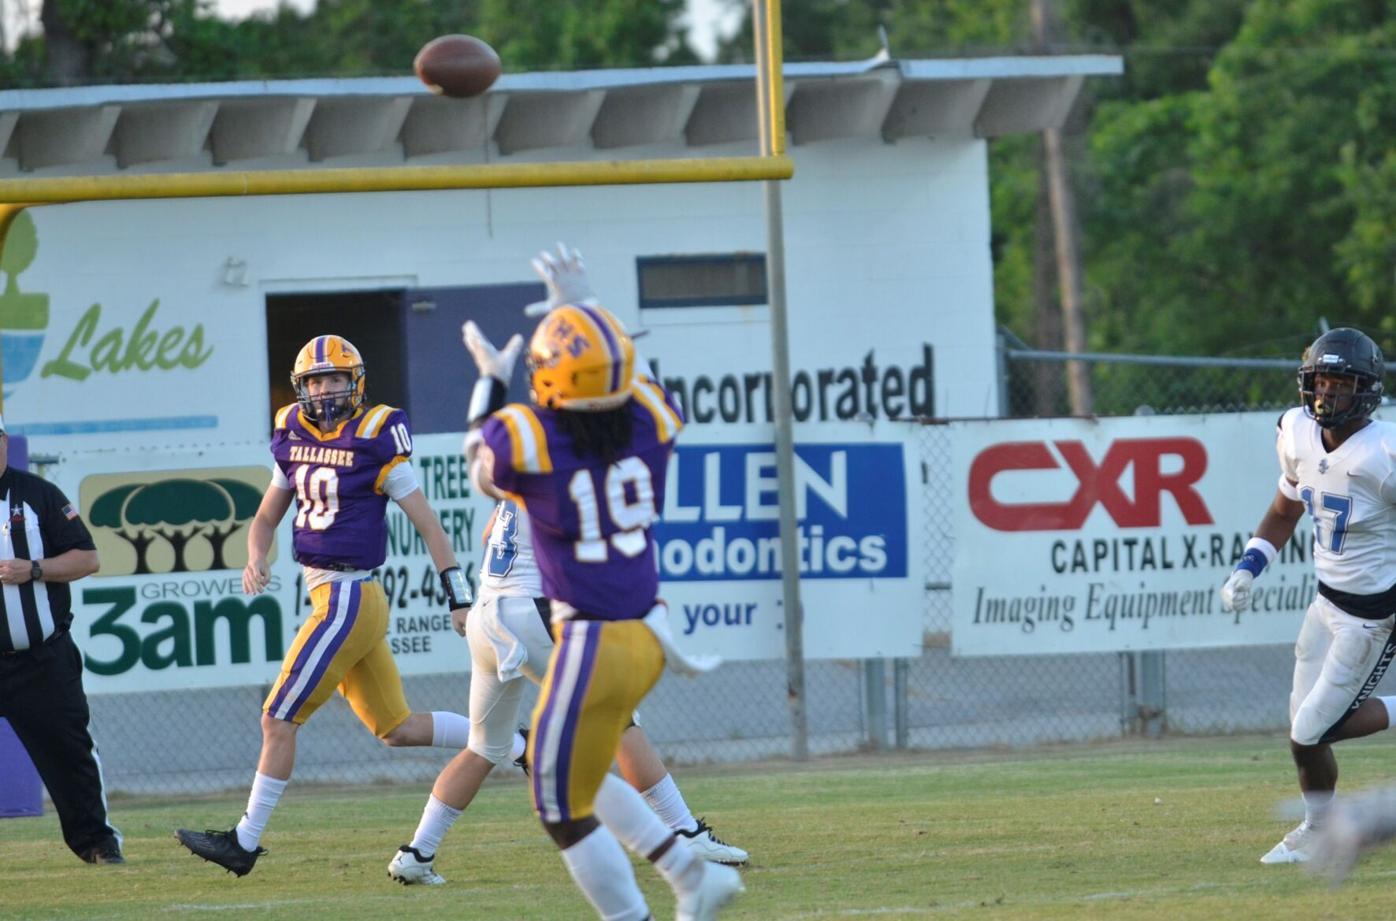 Tallassee Montgomery Catholic football